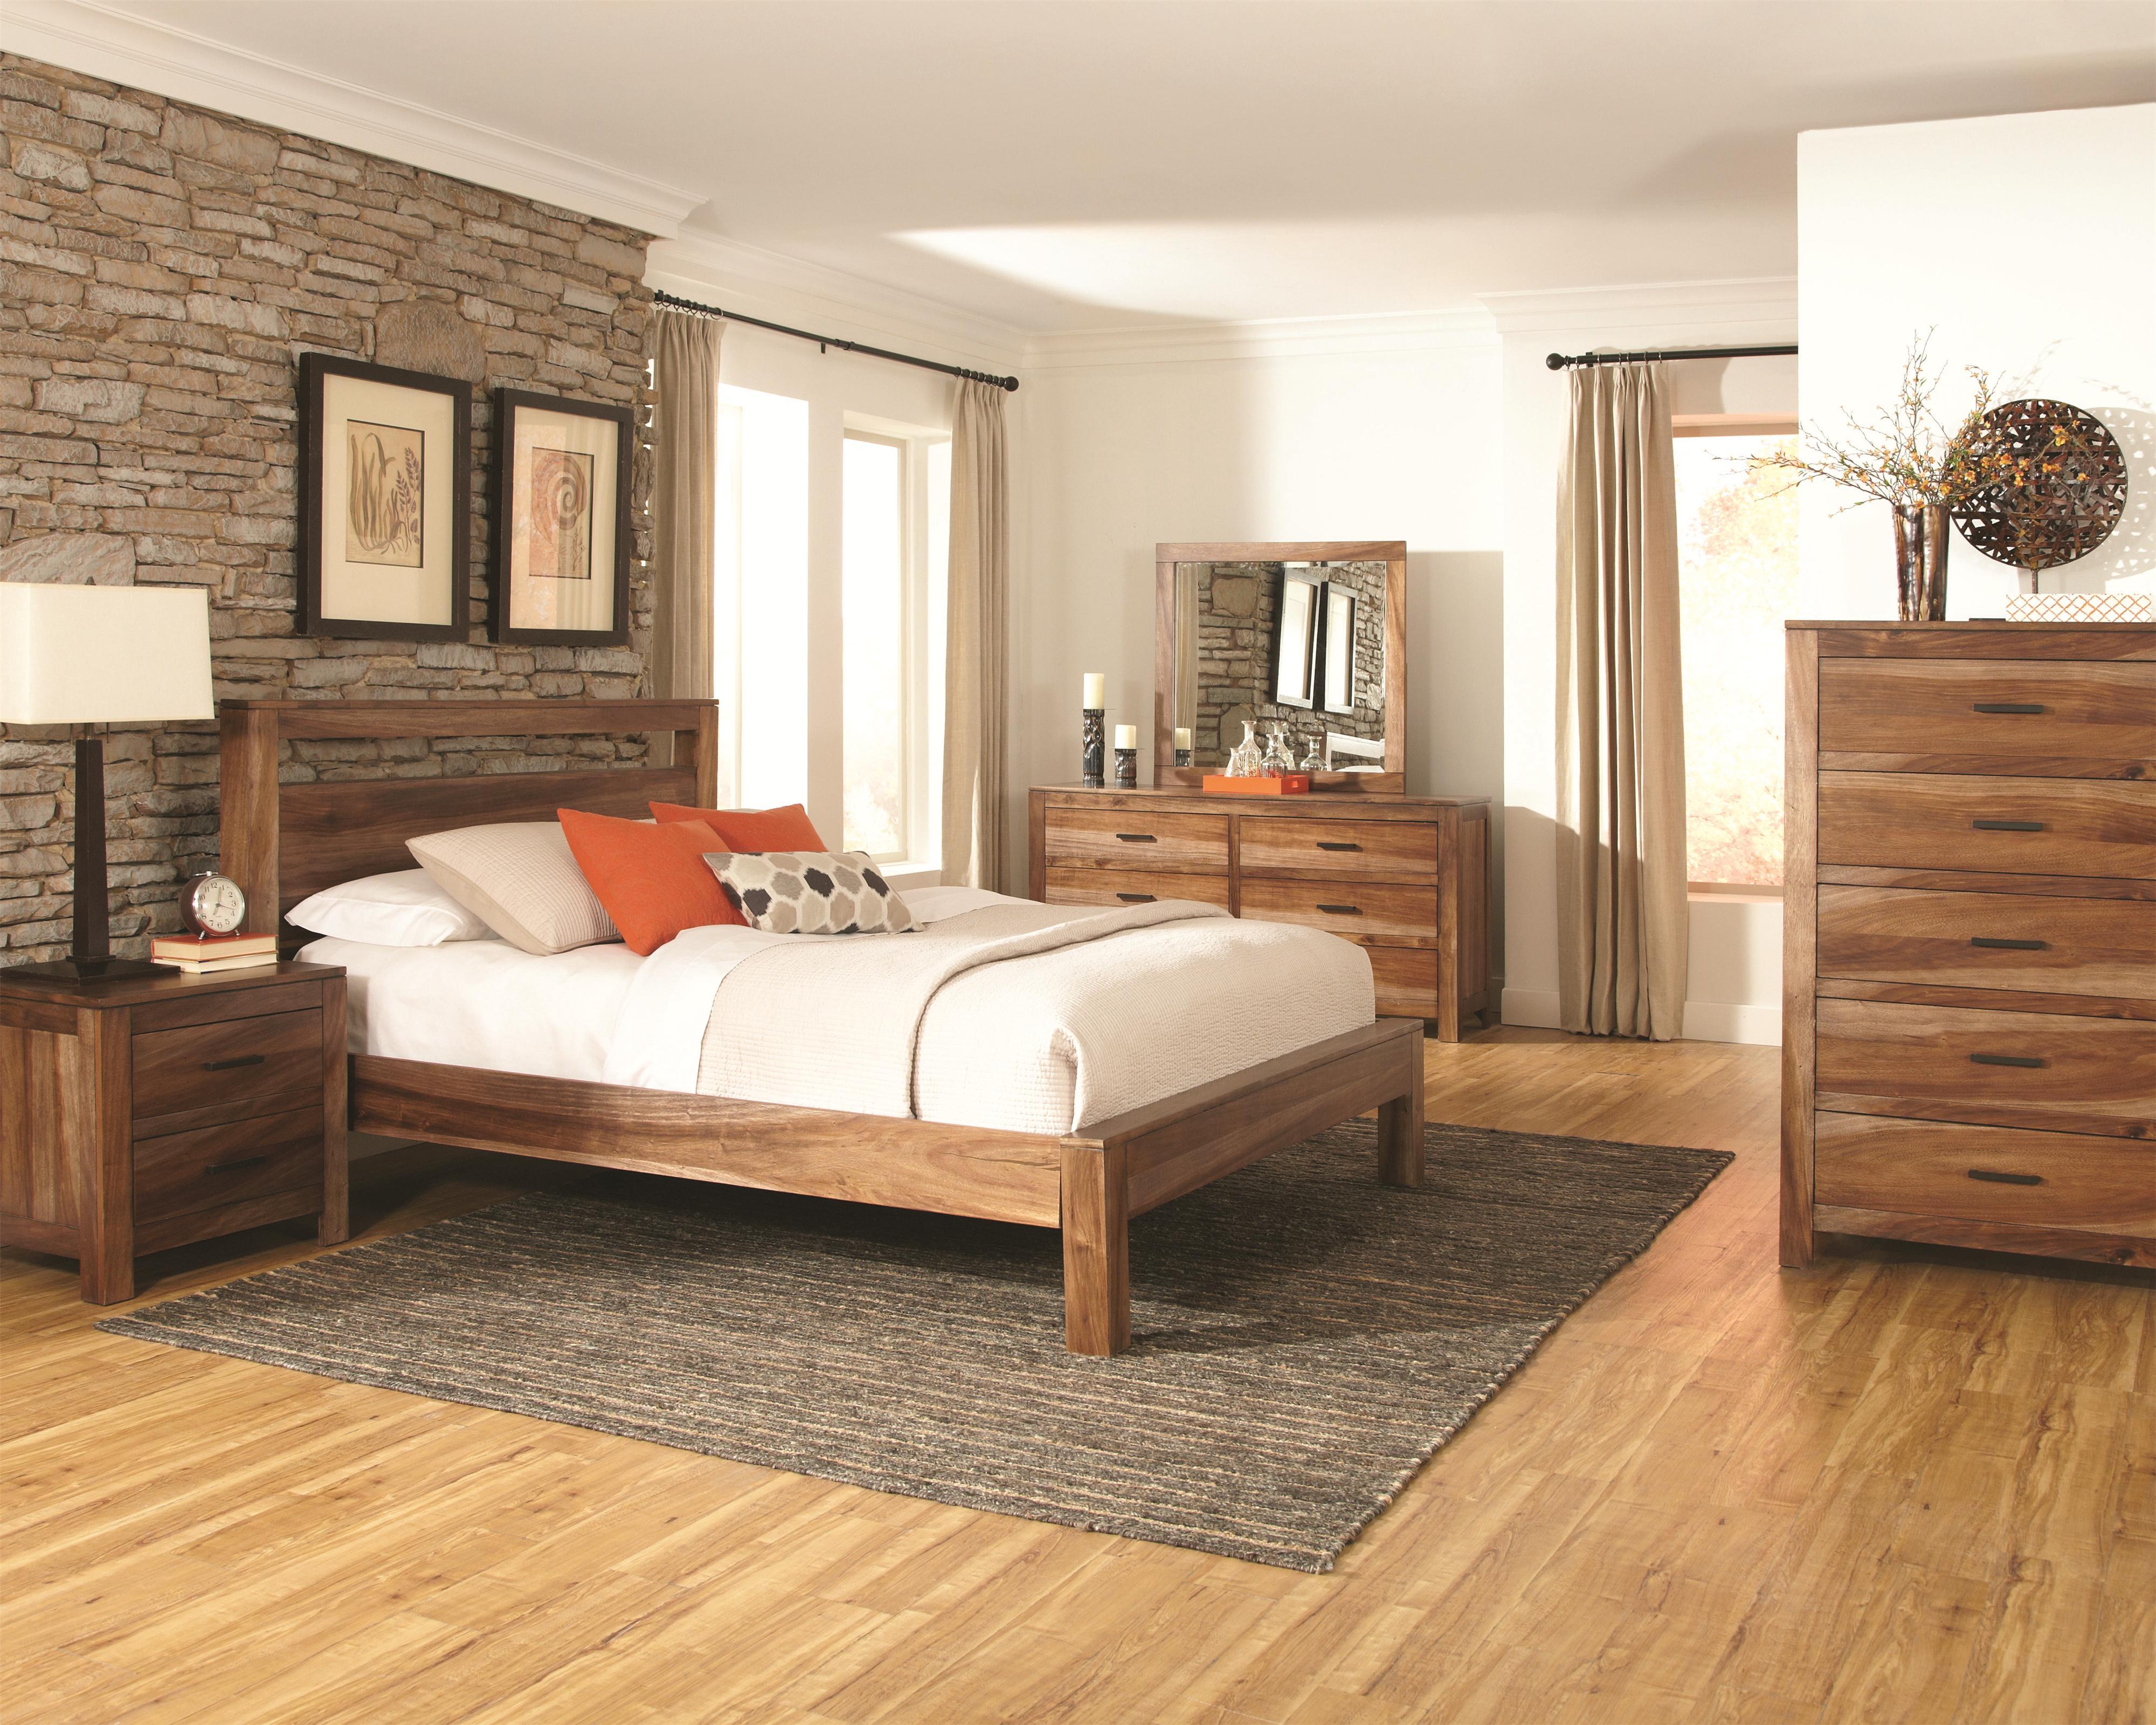 Rustic wood platform bed - Rustic Wood Platform Bed